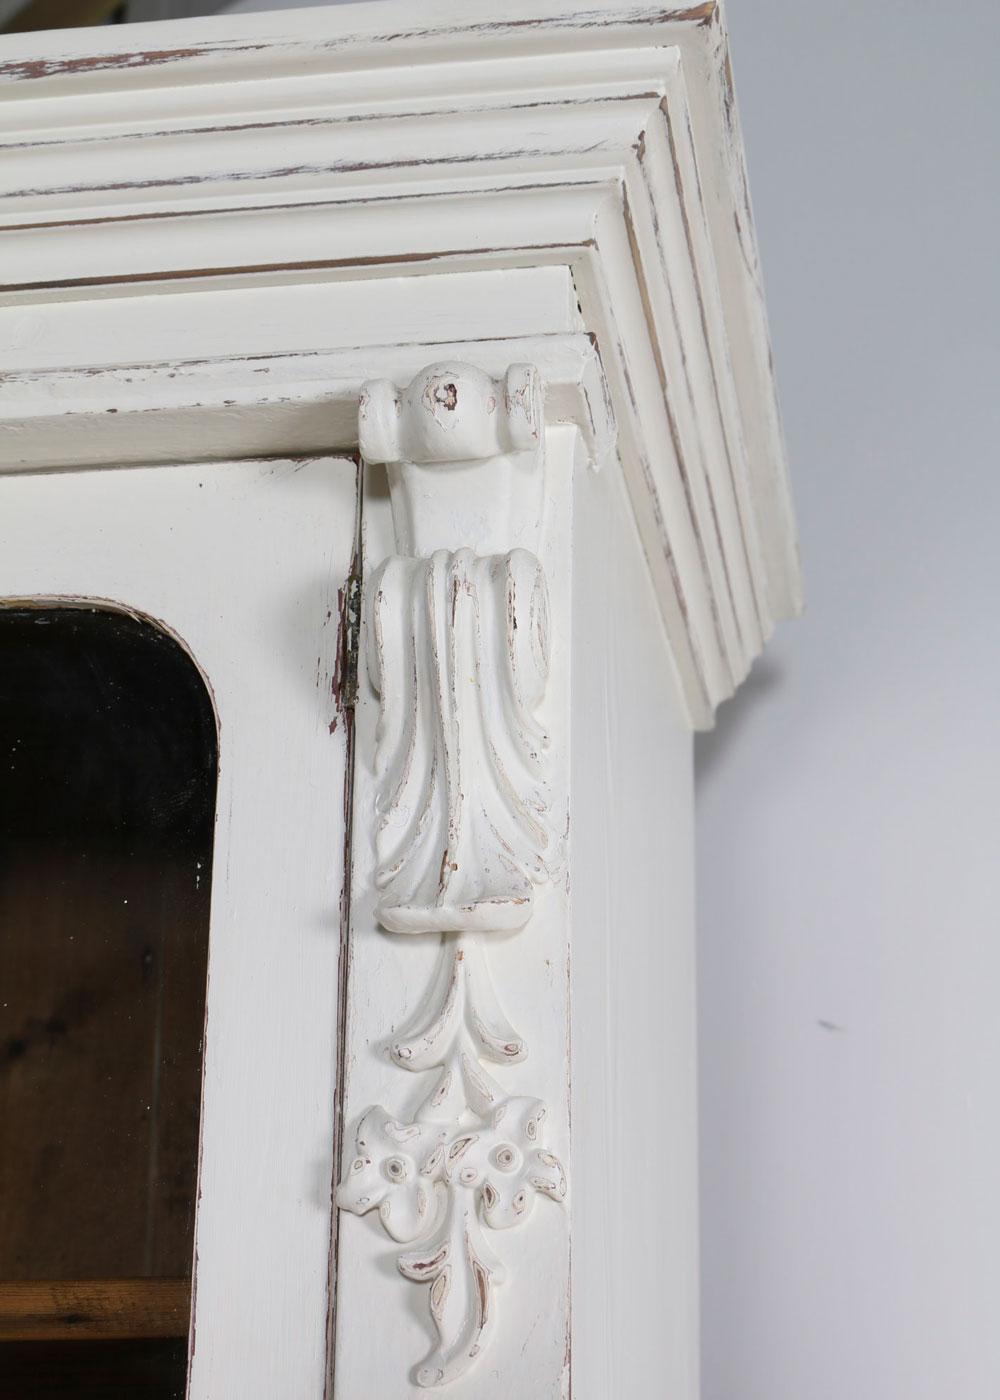 White china cabinet cornice detail